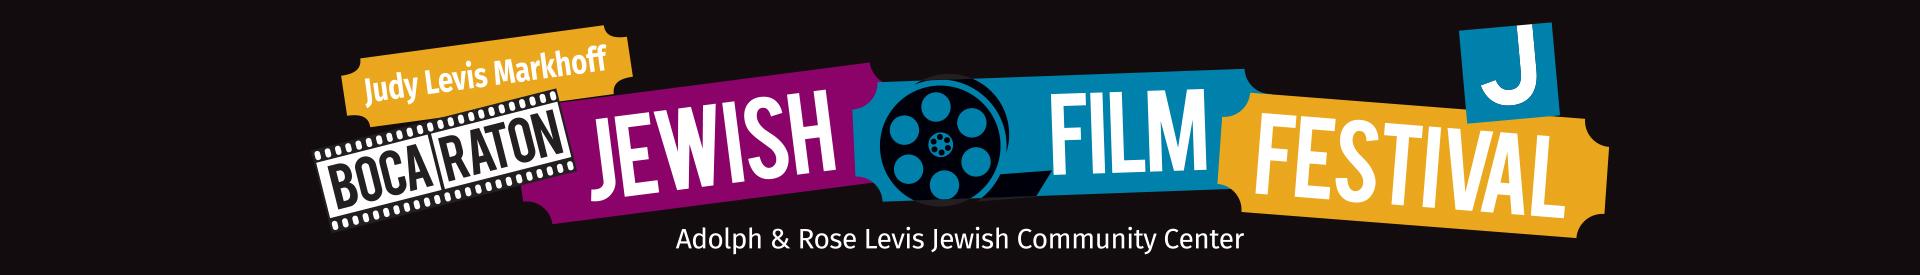 Judy Levis Markhoff Boca Raton Jewish Film Festival